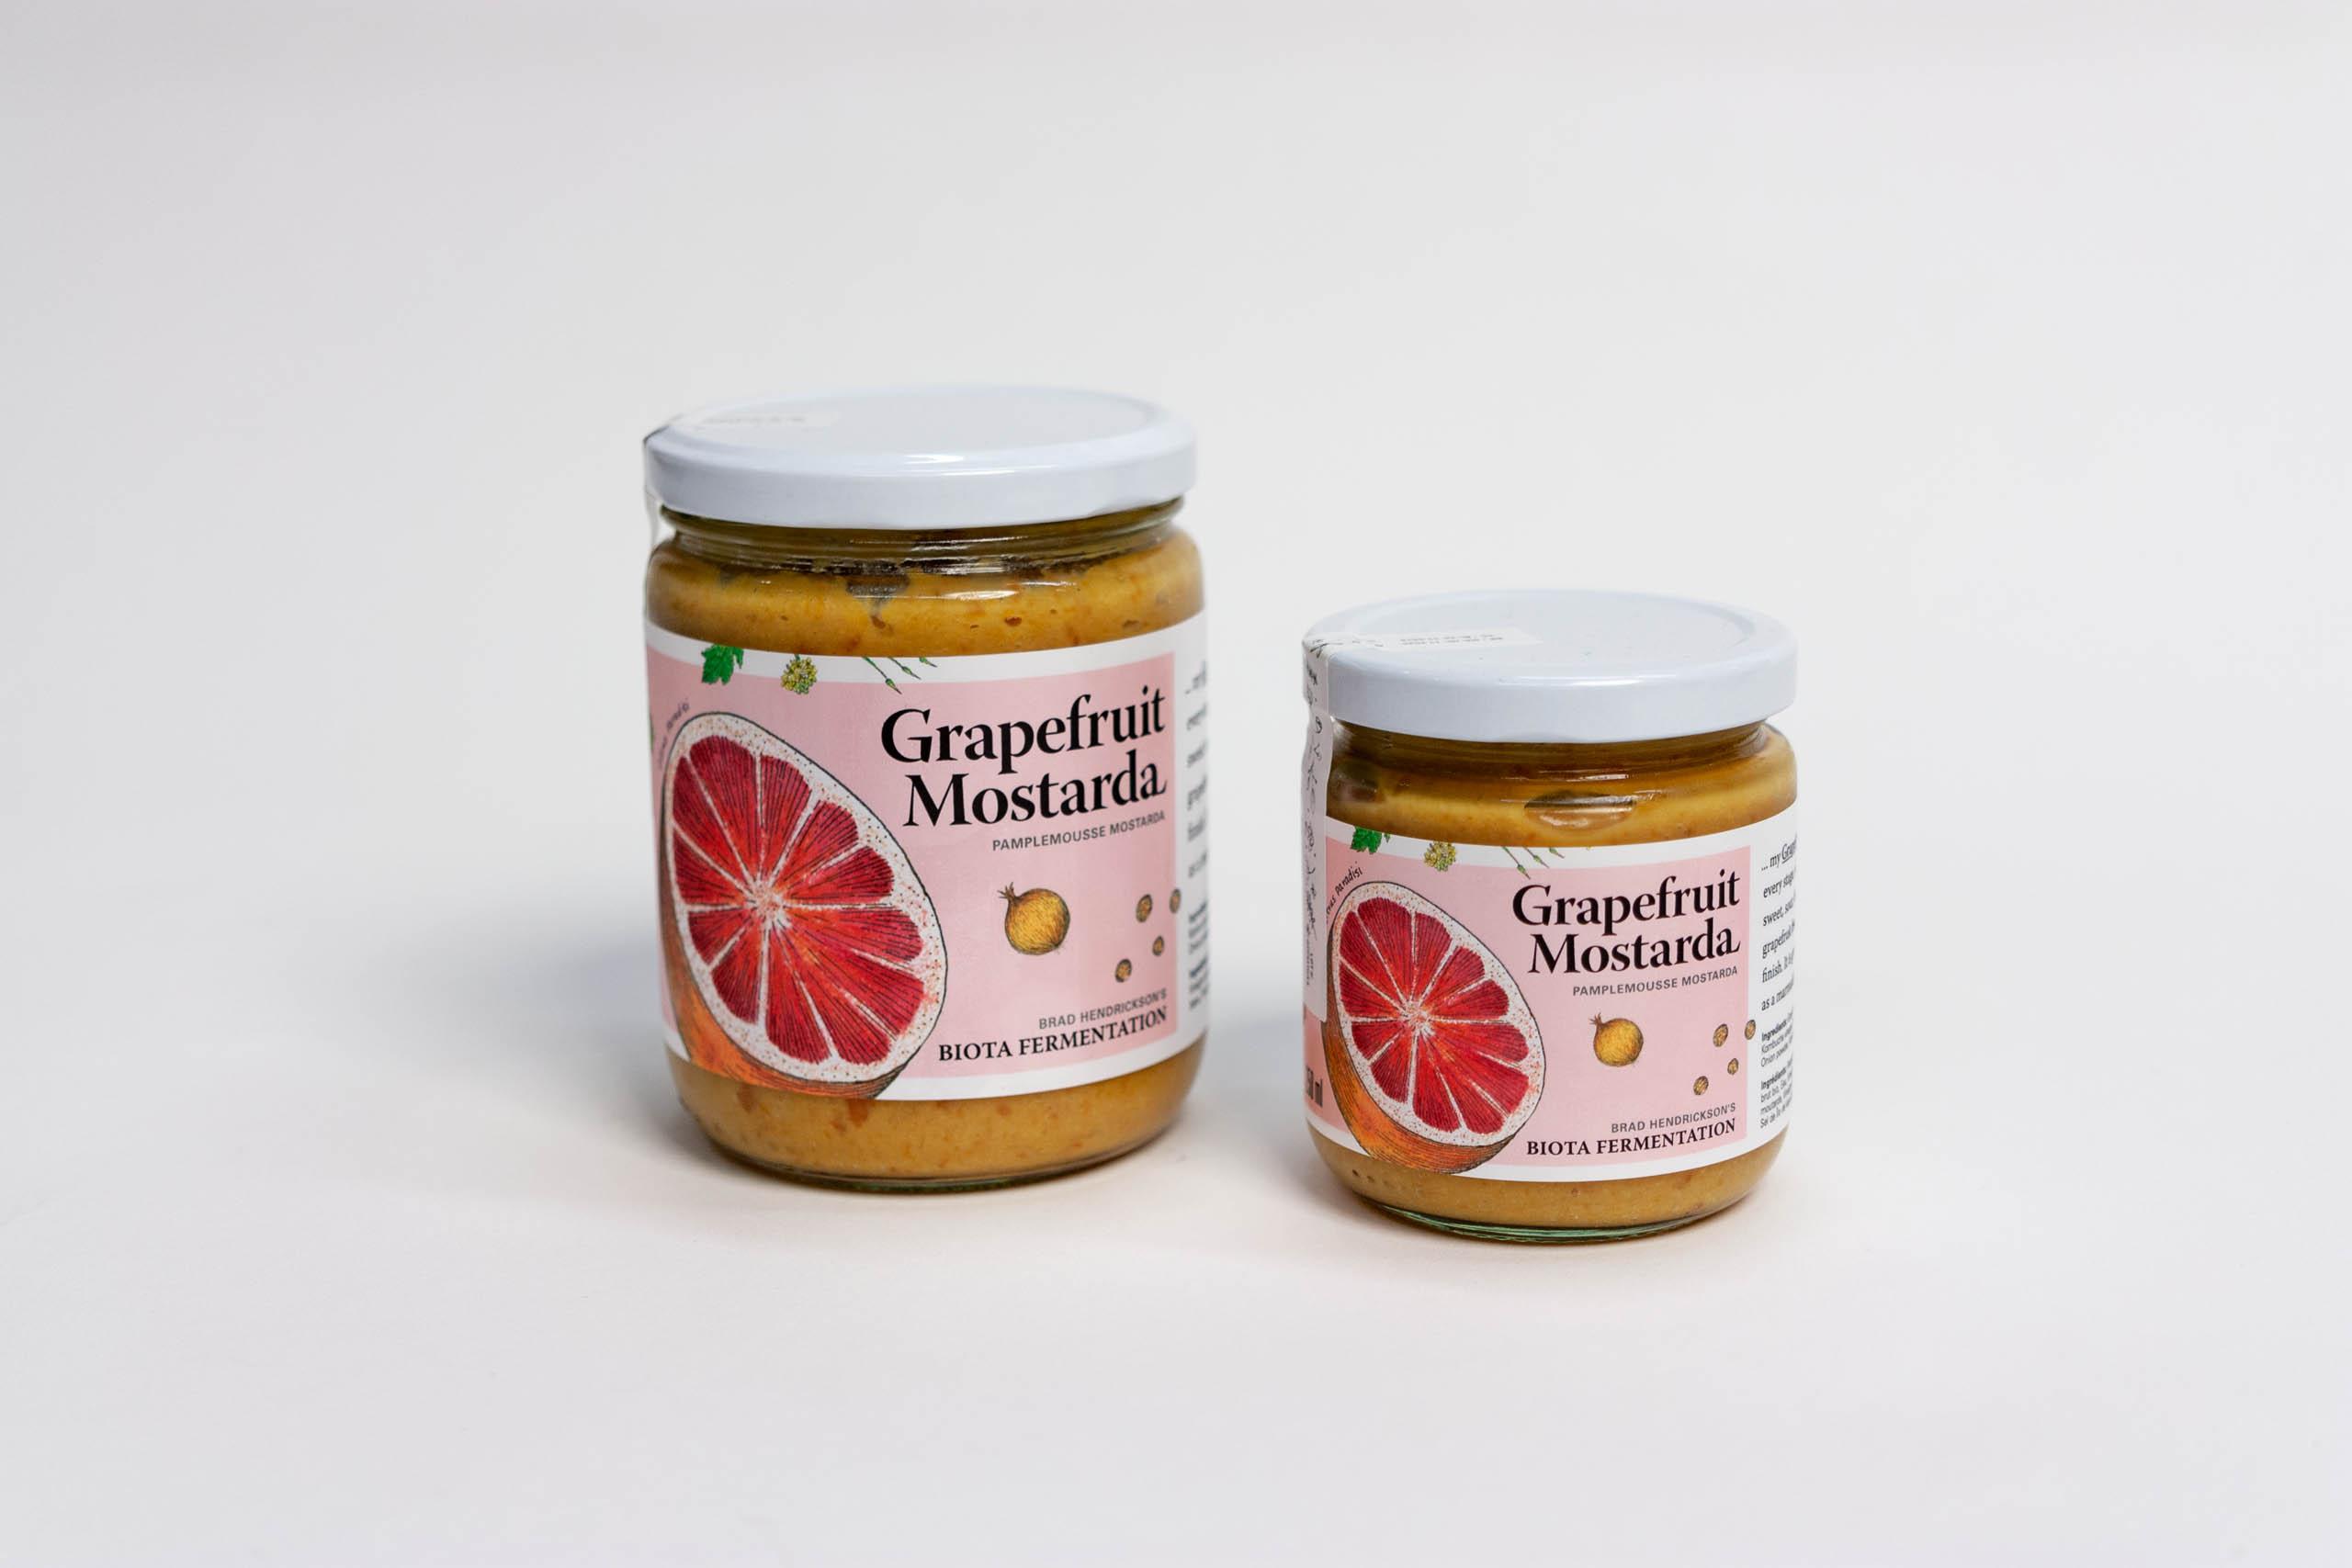 Grapefruit Mostarda Jars with grapefruit illustrations on a light pink background — by Yagnyuk.